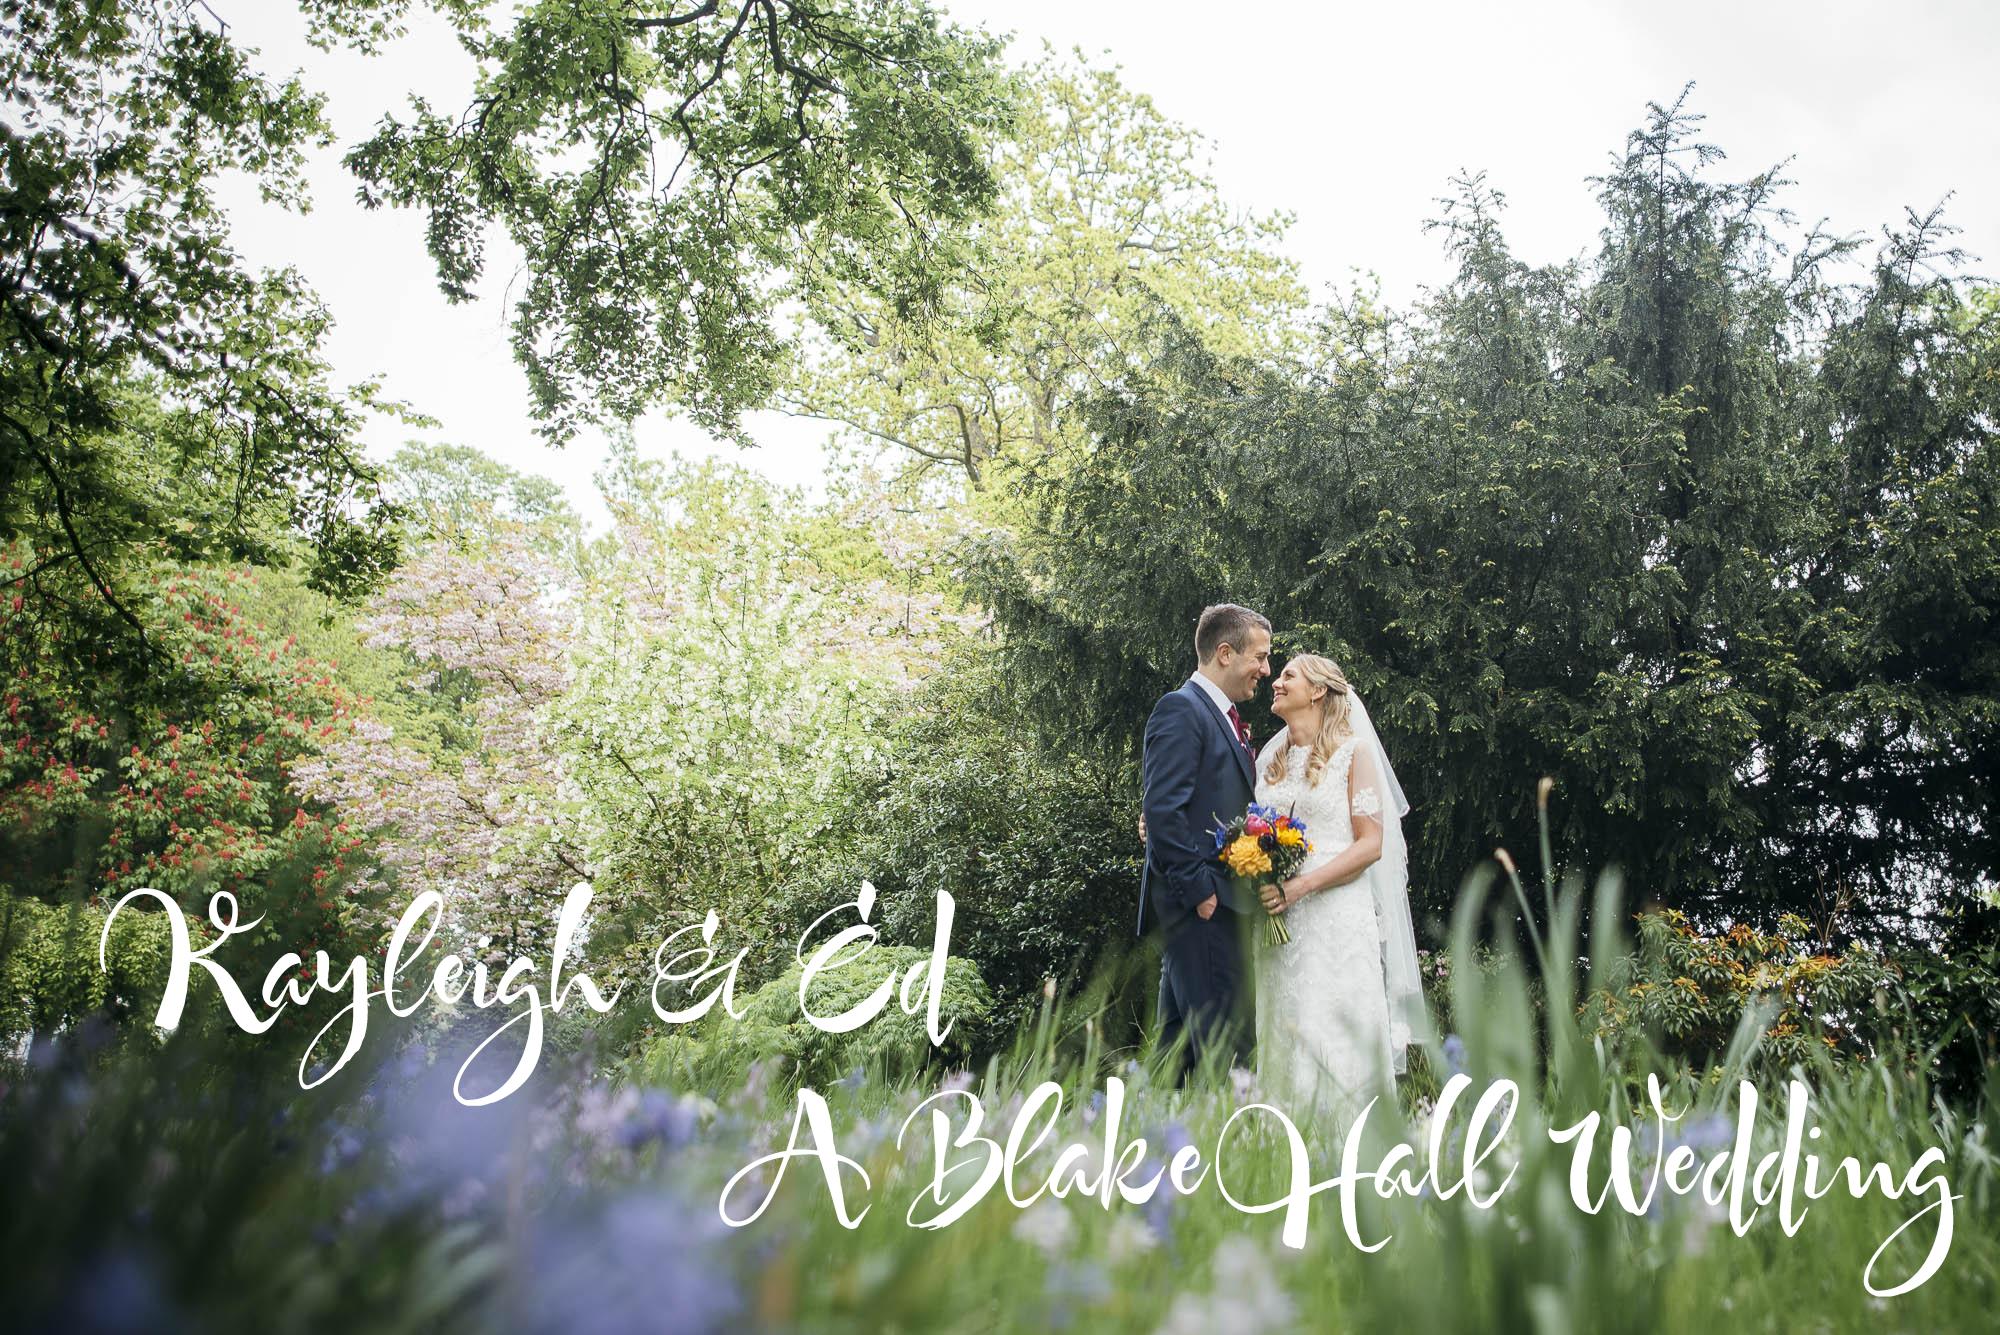 Blake Hall Wedding Photographer - Documentary Essex Wedding Photographer